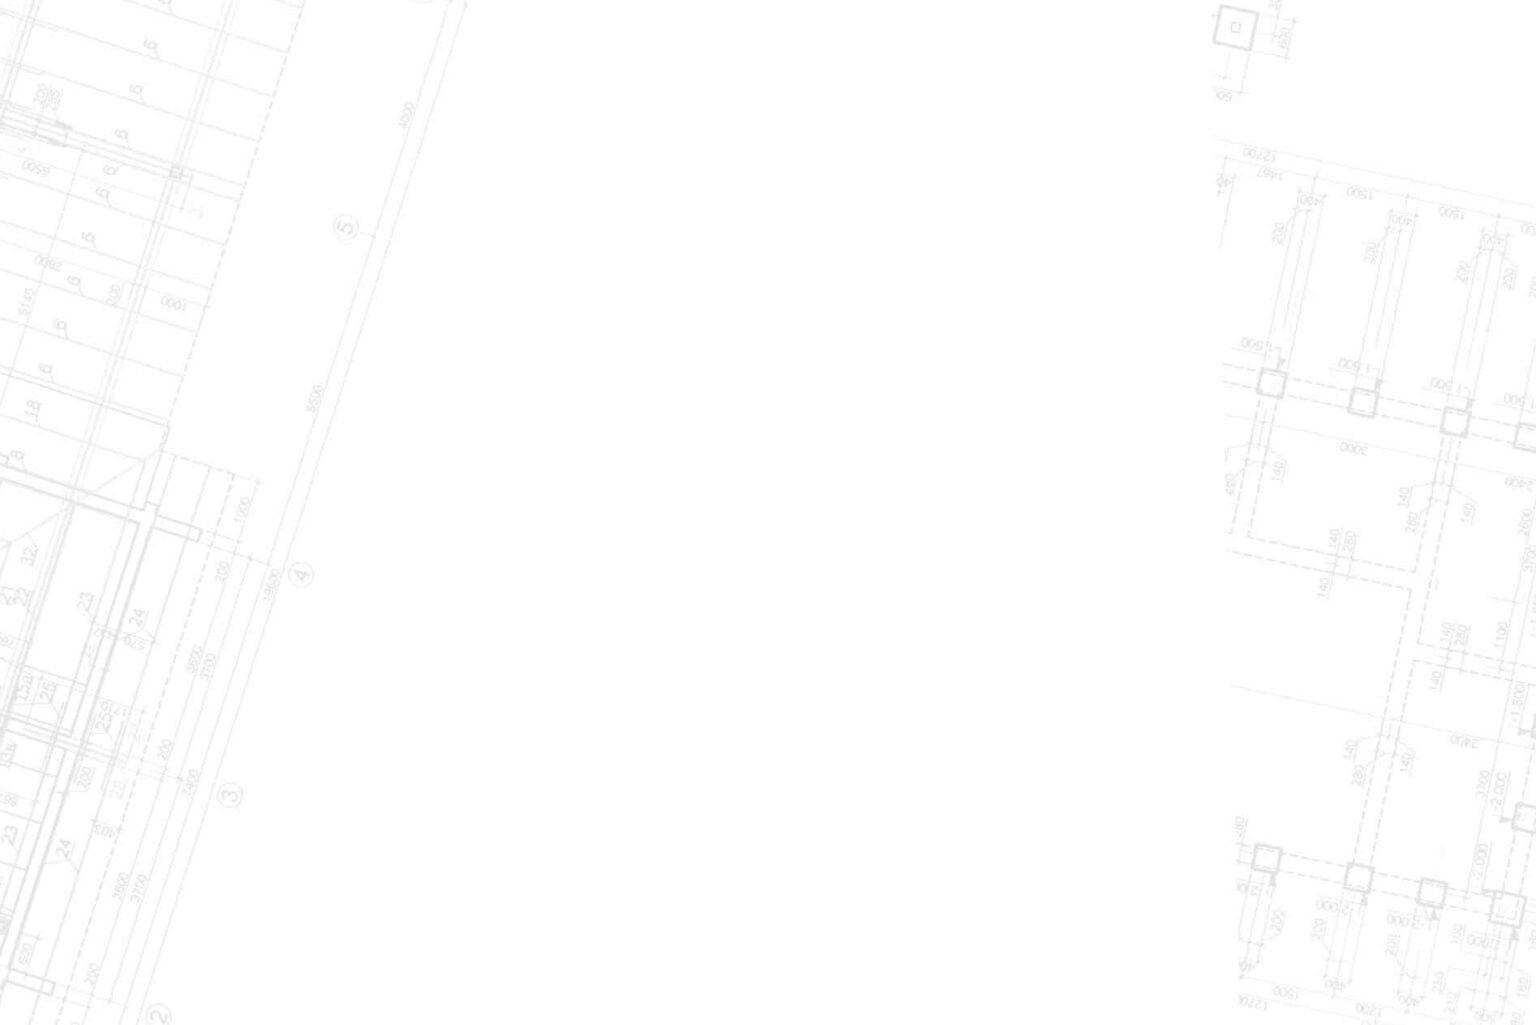 https://syga.es/wp-content/uploads/reimagina-tu-espacio-home-1536x1025.jpg